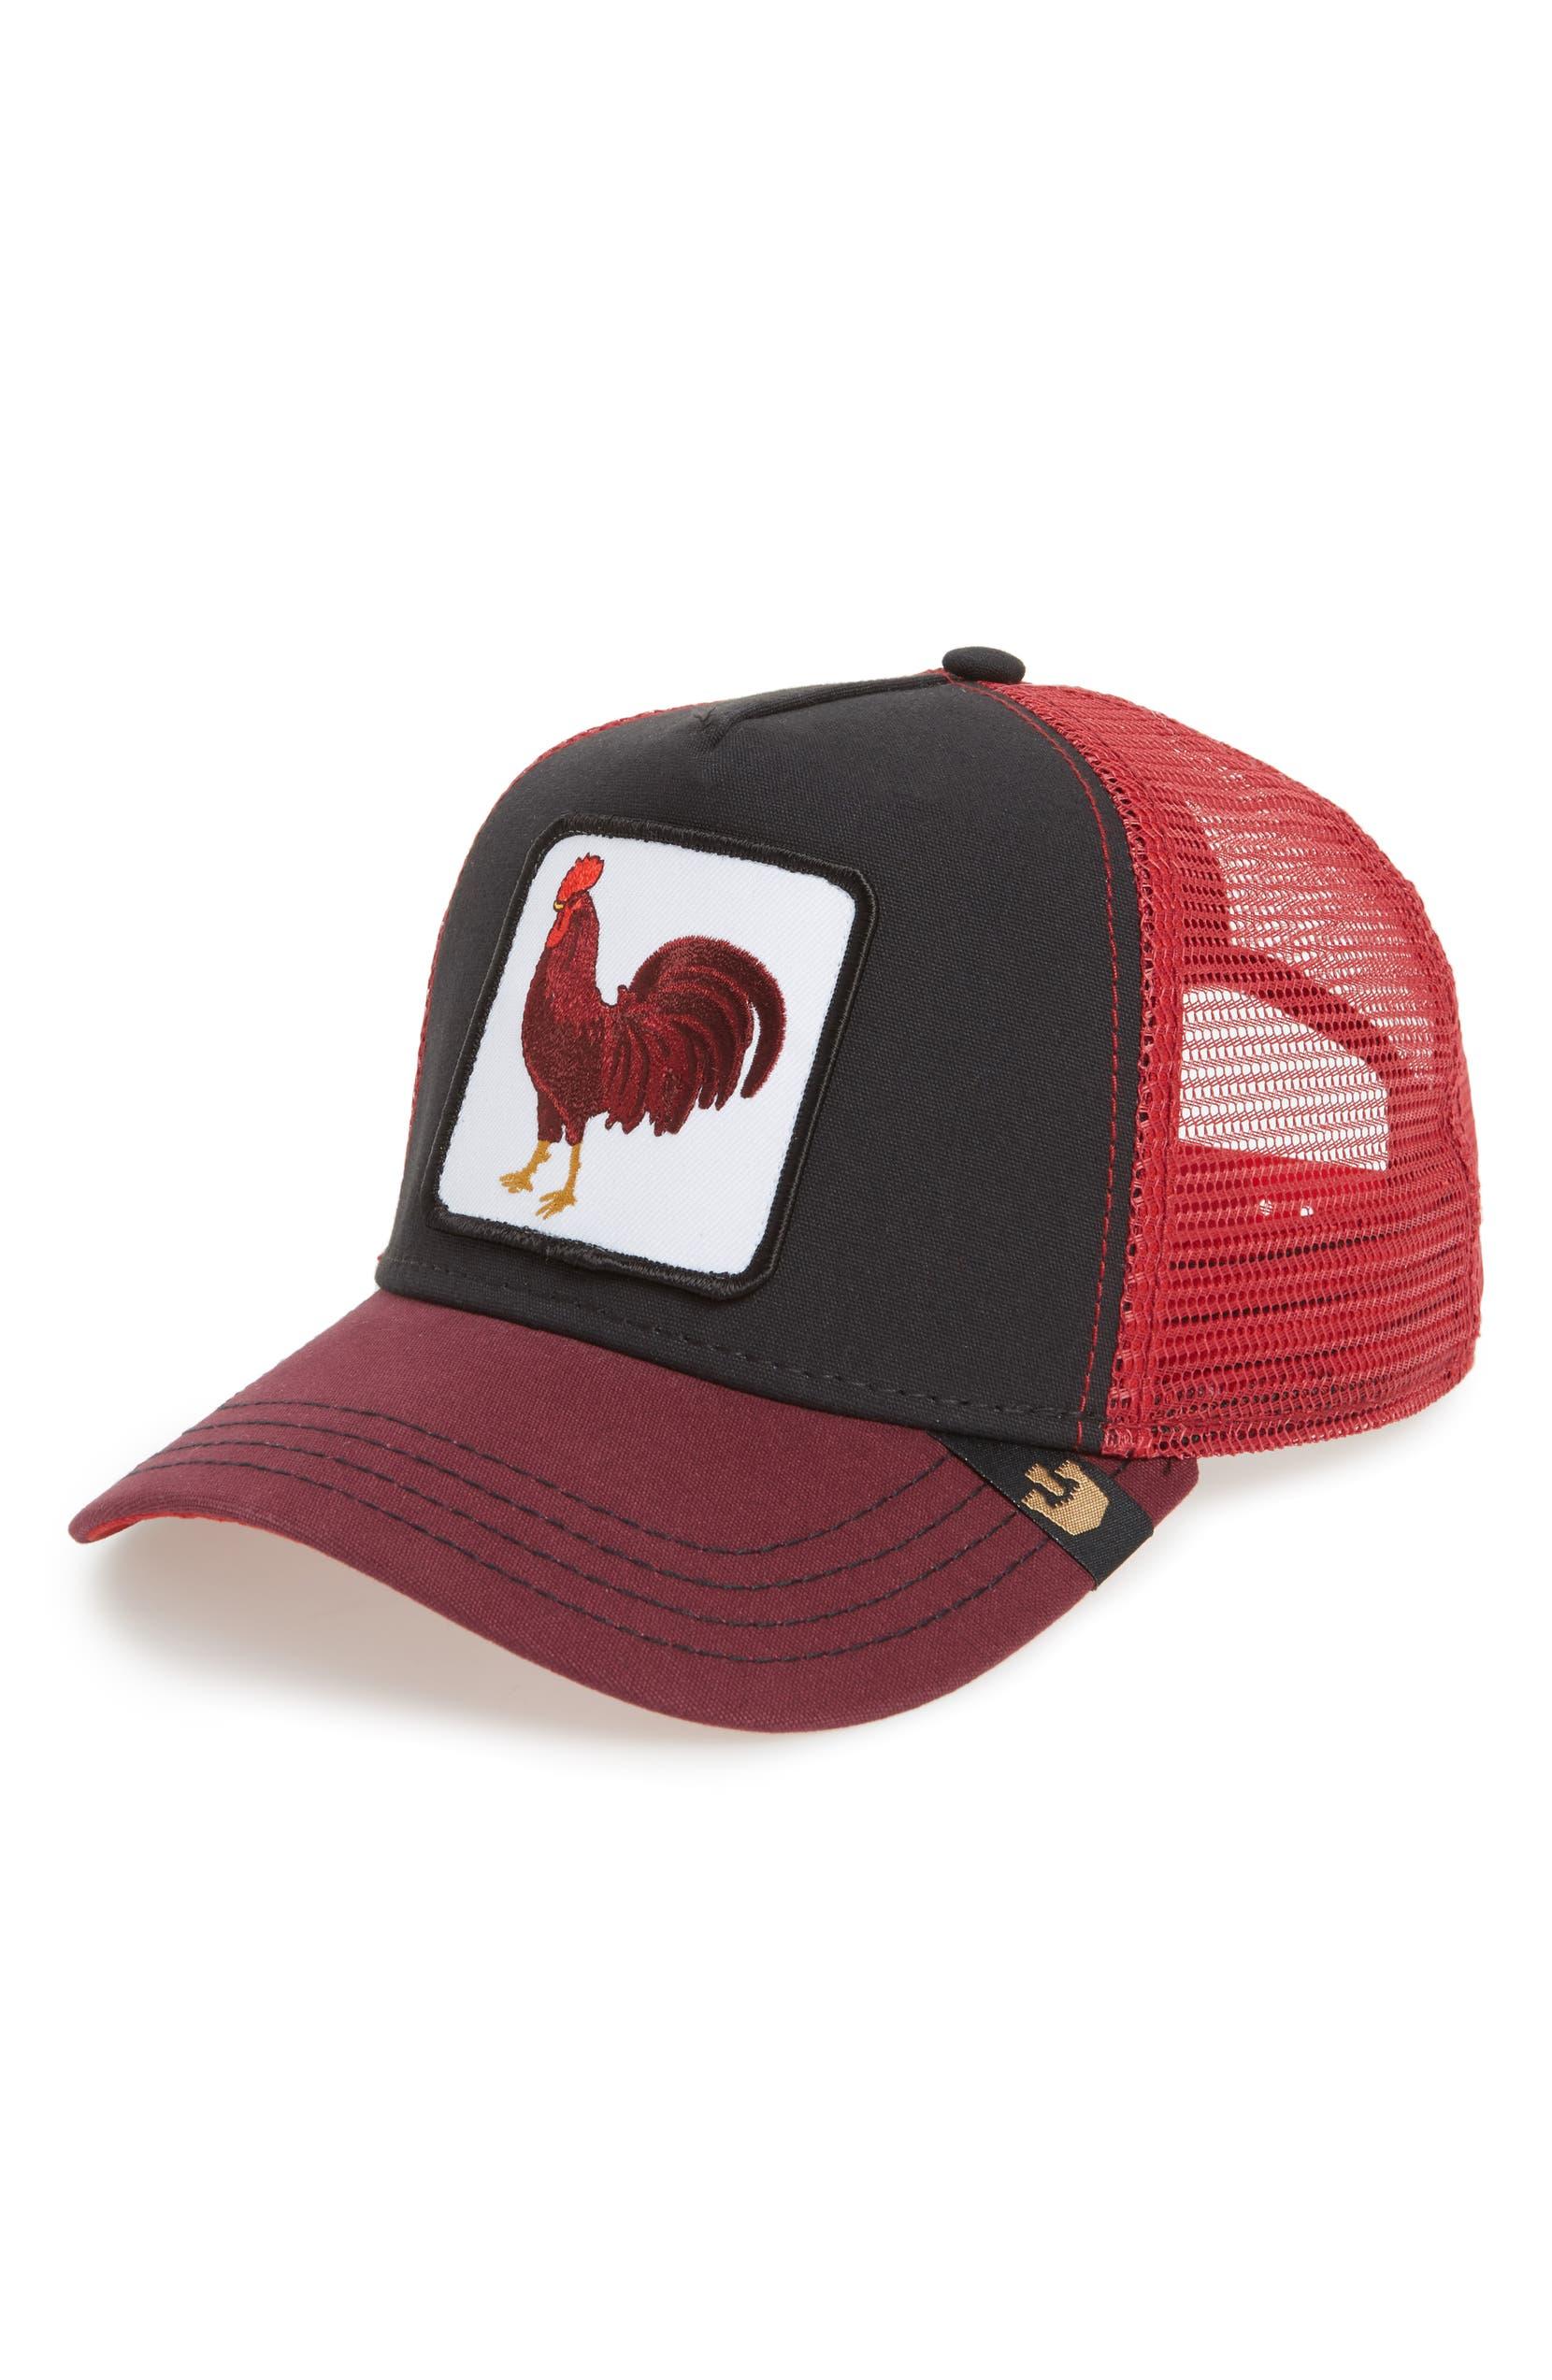 Goorin Brothers Barnyard King Trucker Hat  12e62abada0f